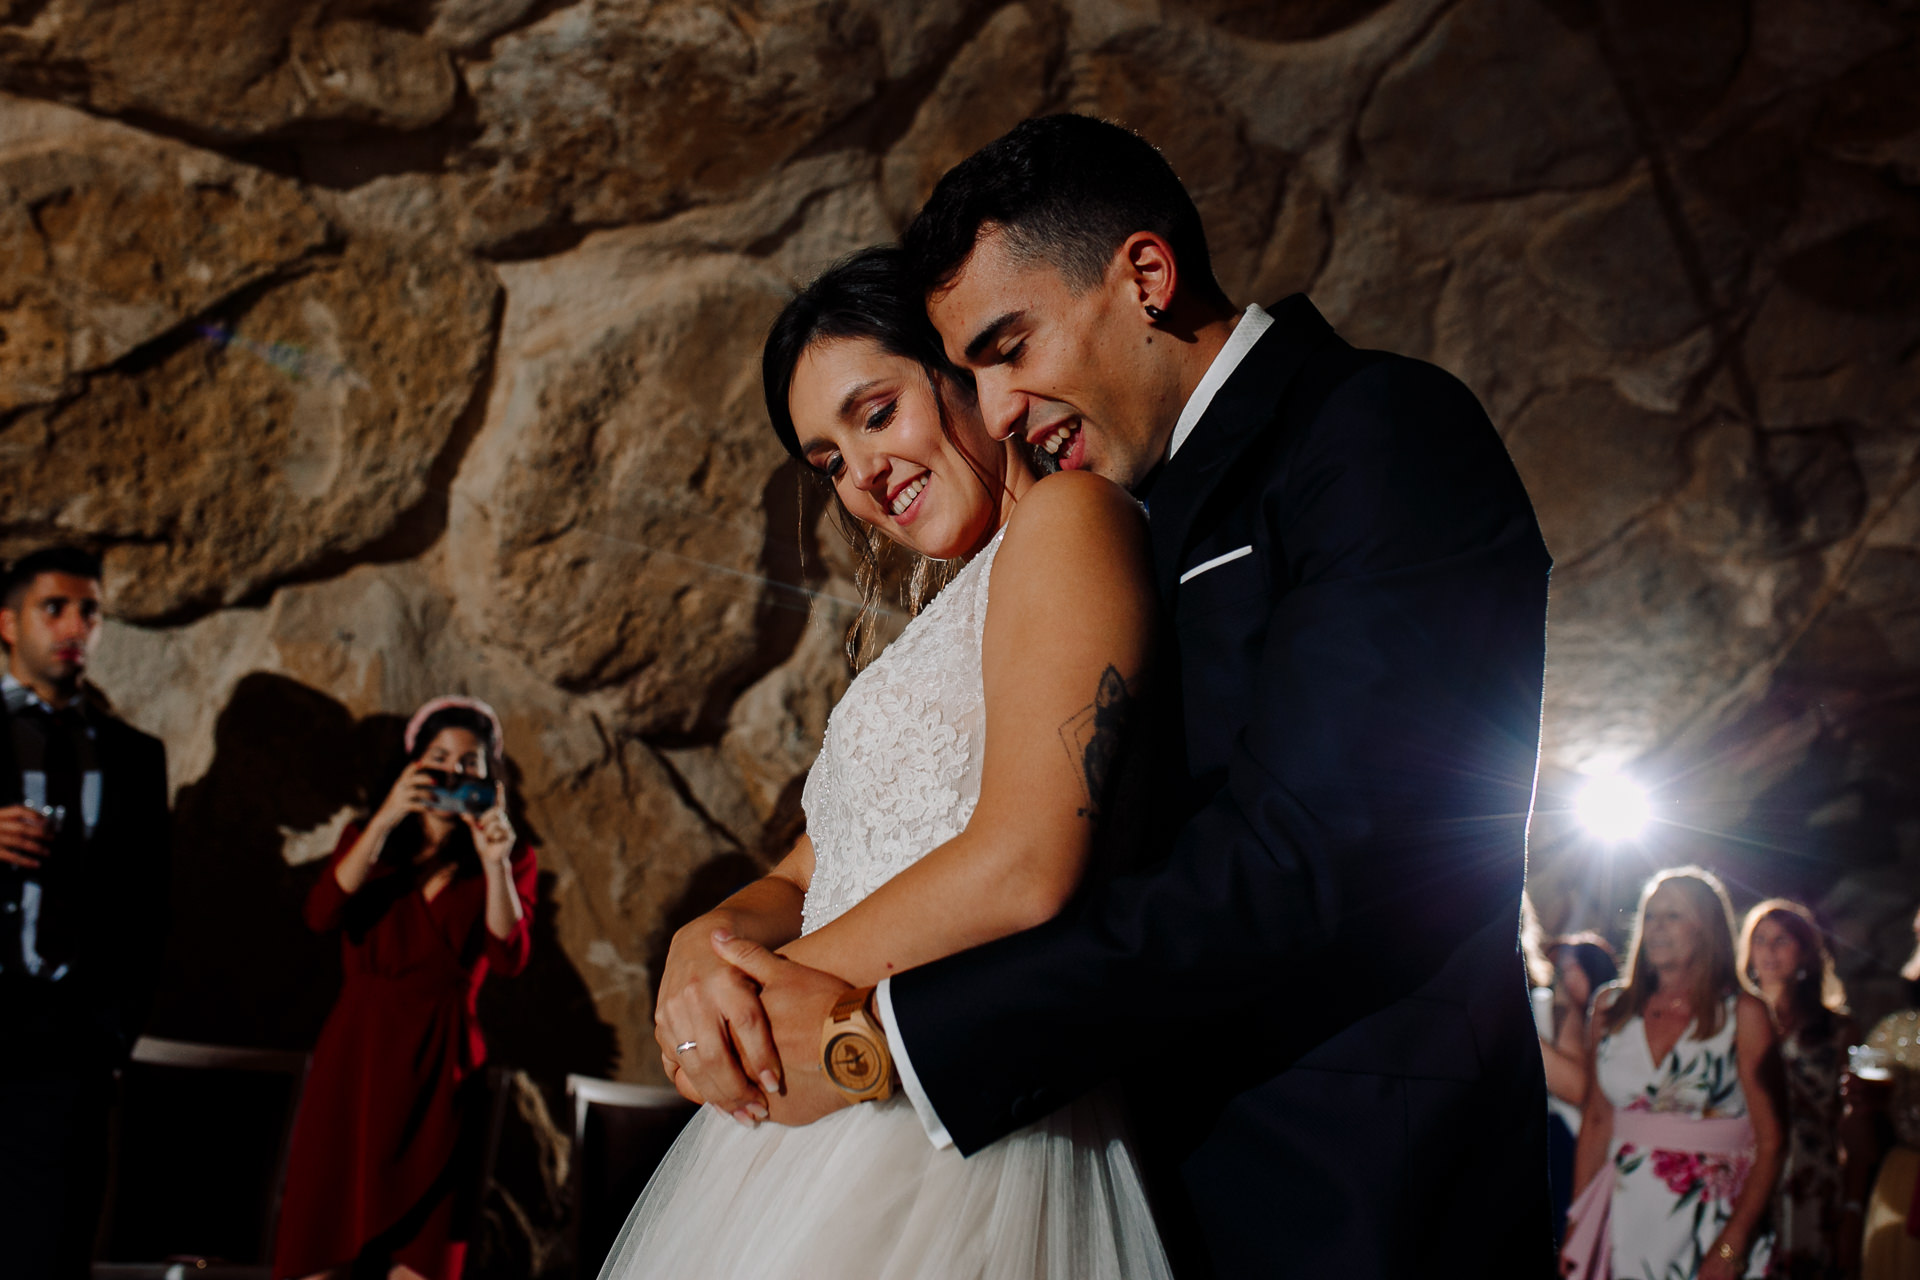 boda civil eguren ugarte larioja 201235